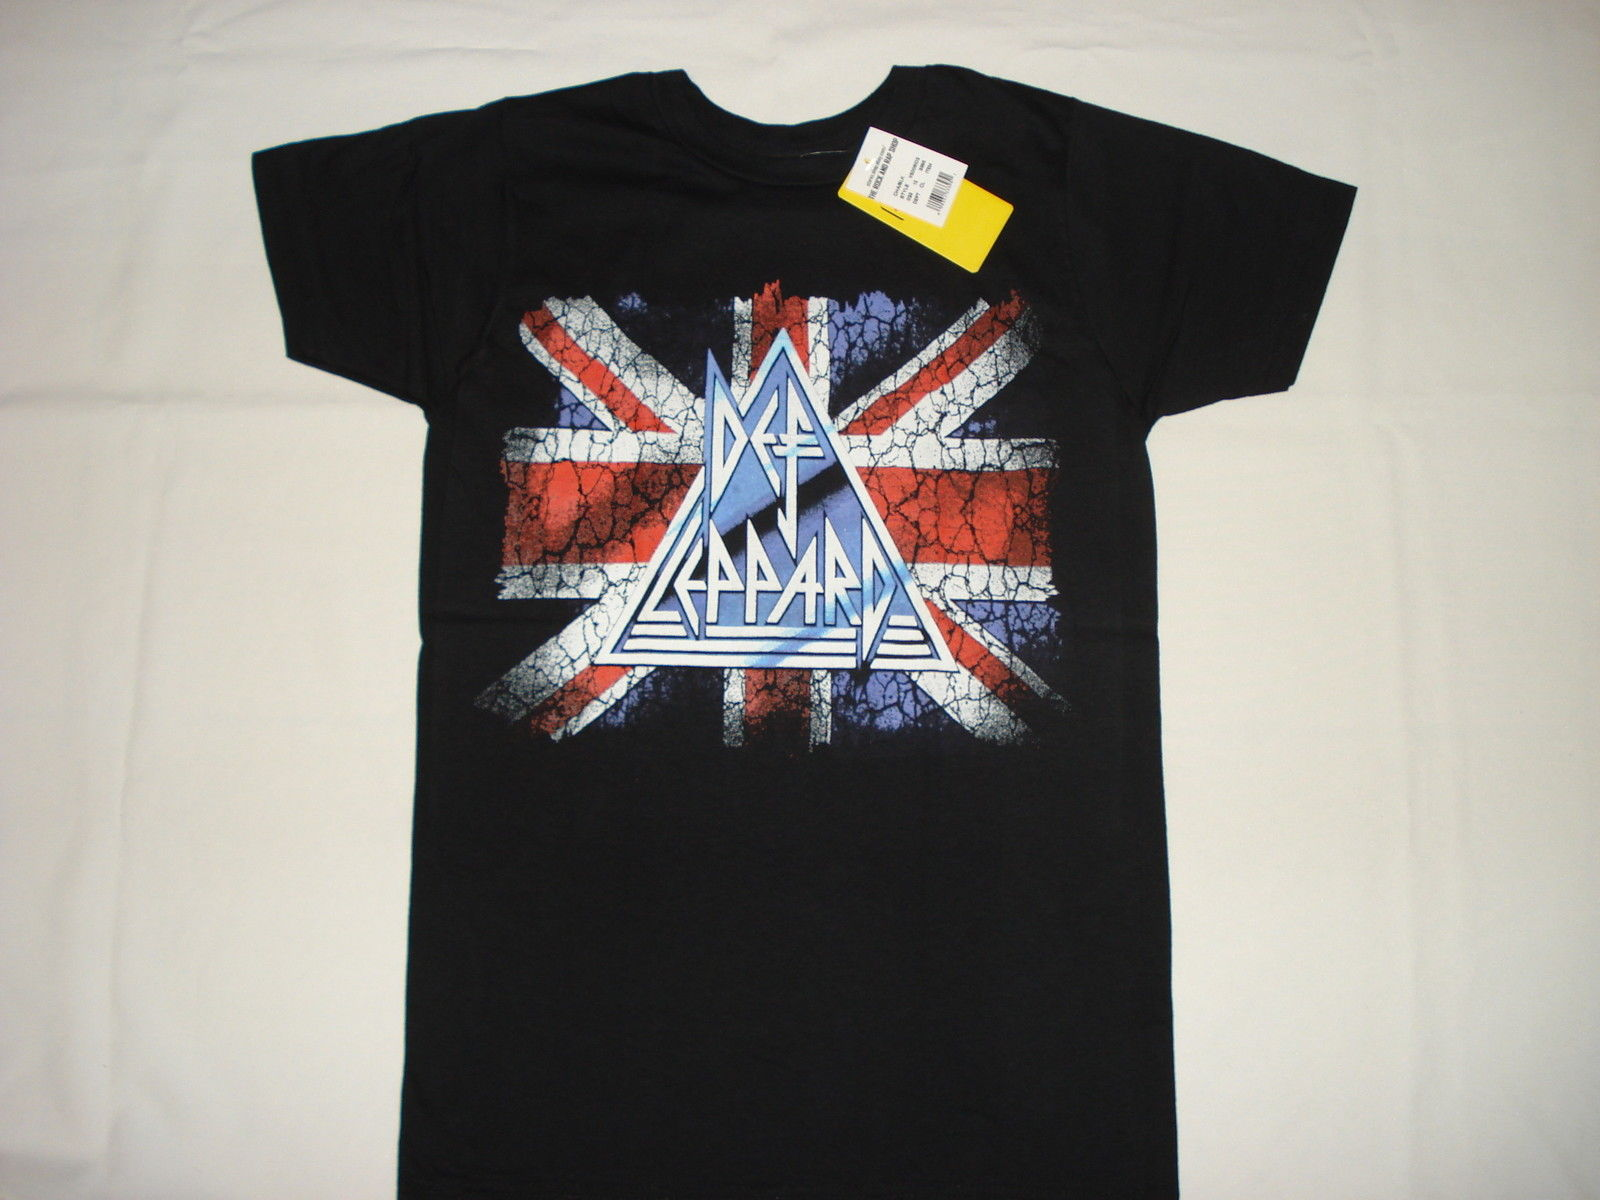 72688f22 DEF LEPPARD UK FLAG NEW T-SHIRT S M L XL 2XL METAL ROCK BAND JOE ELLIOT  RICK SAV Short Sleeve Round Neck T Shirt Promotion